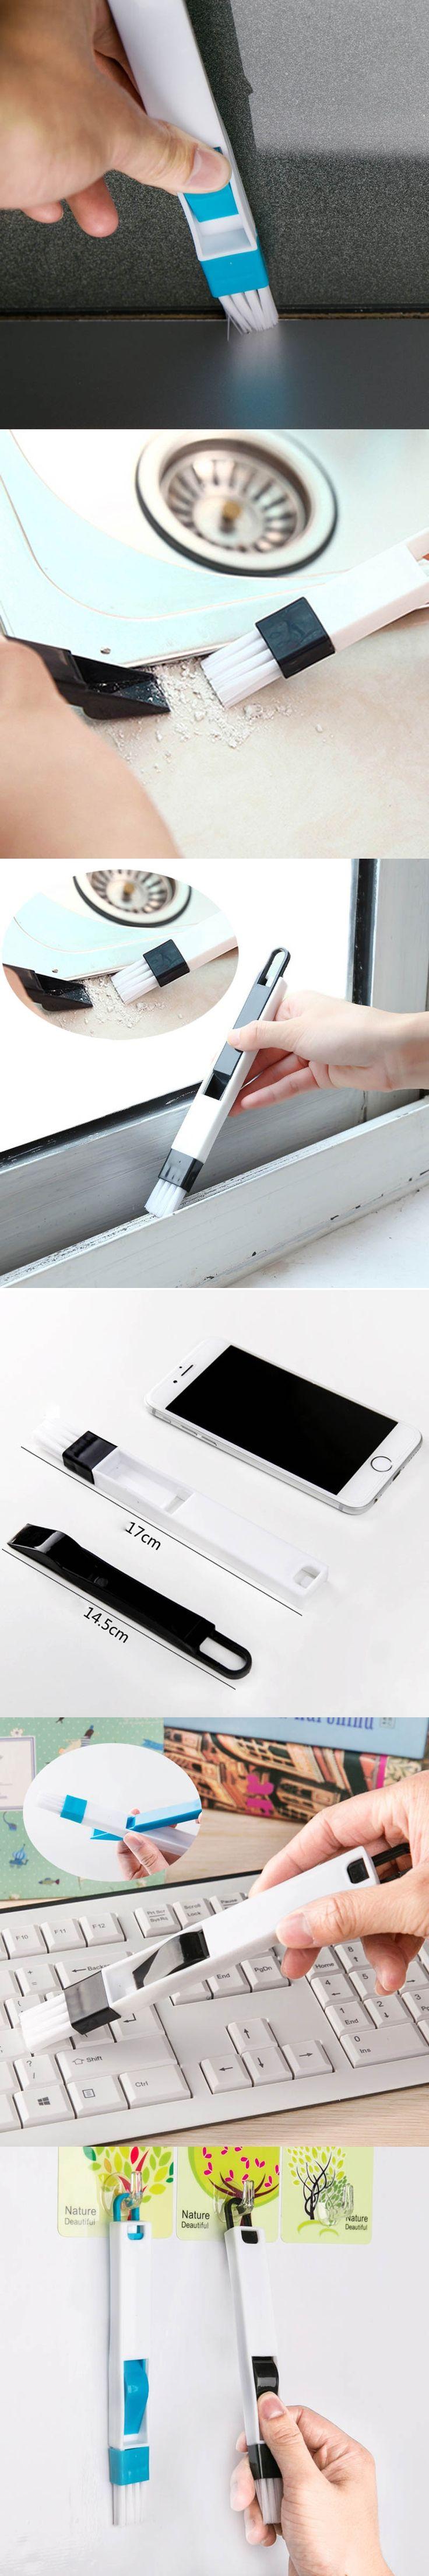 Multi-function Window Door Dusting Cleaning Brush With Dustpan Screen Keyboard Drawer Wardrobe Gap Corner Brush Cleaning Tool